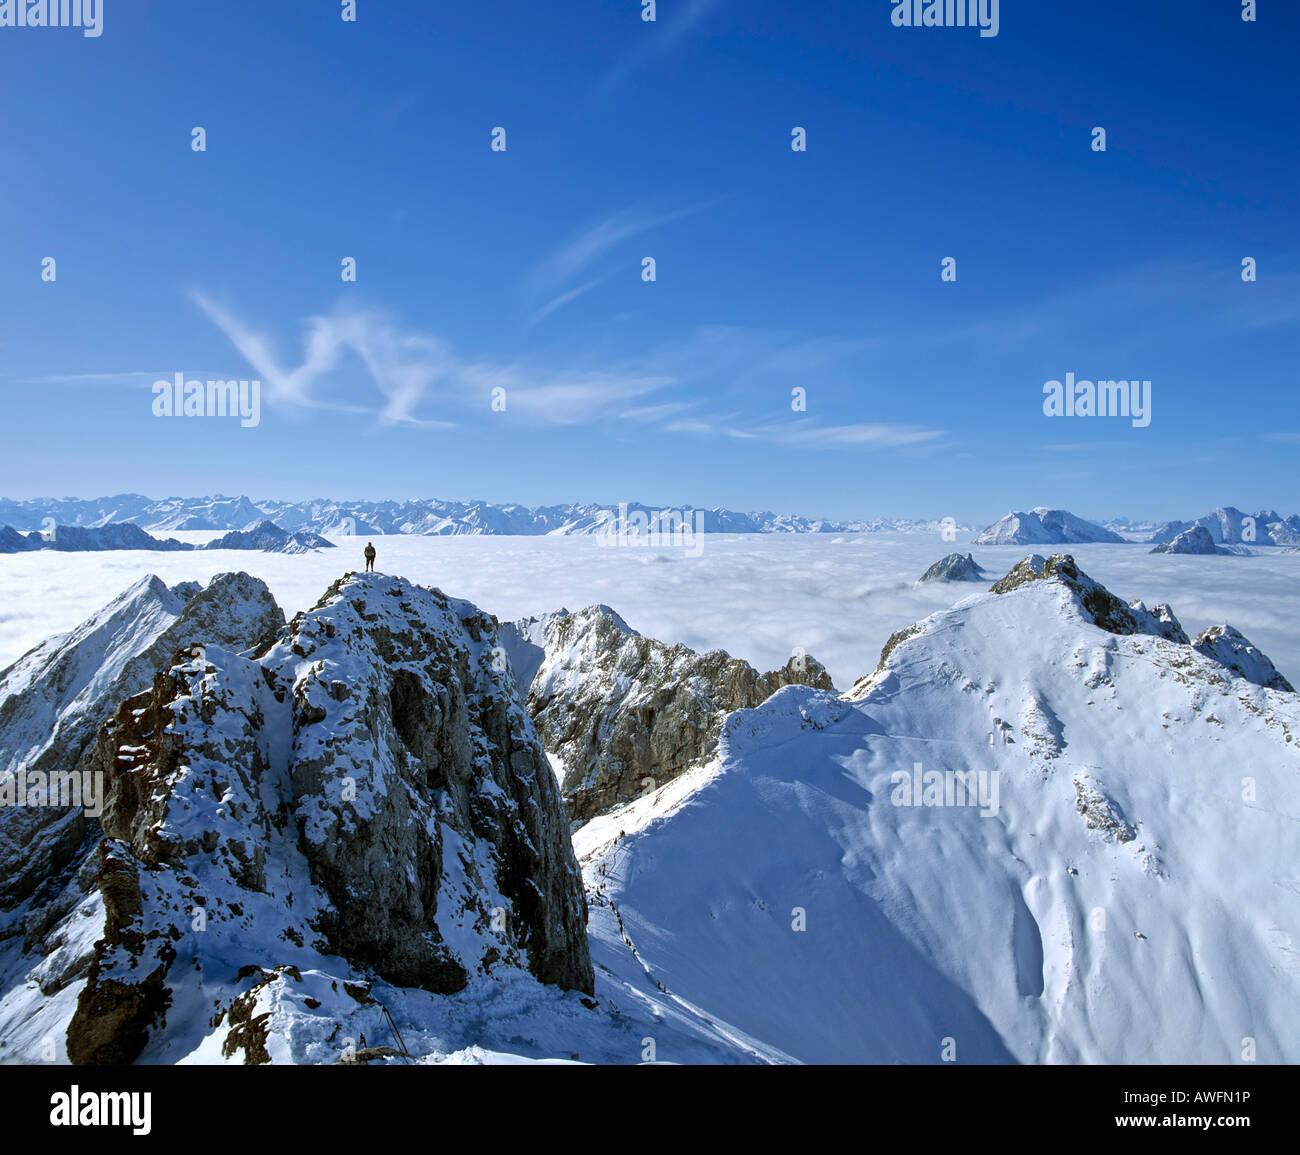 Panoramic view of the western peaks of the Karwendel Range in a sea of fog, Mittenwald, Upper Bavaria, Bavaria, - Stock Image